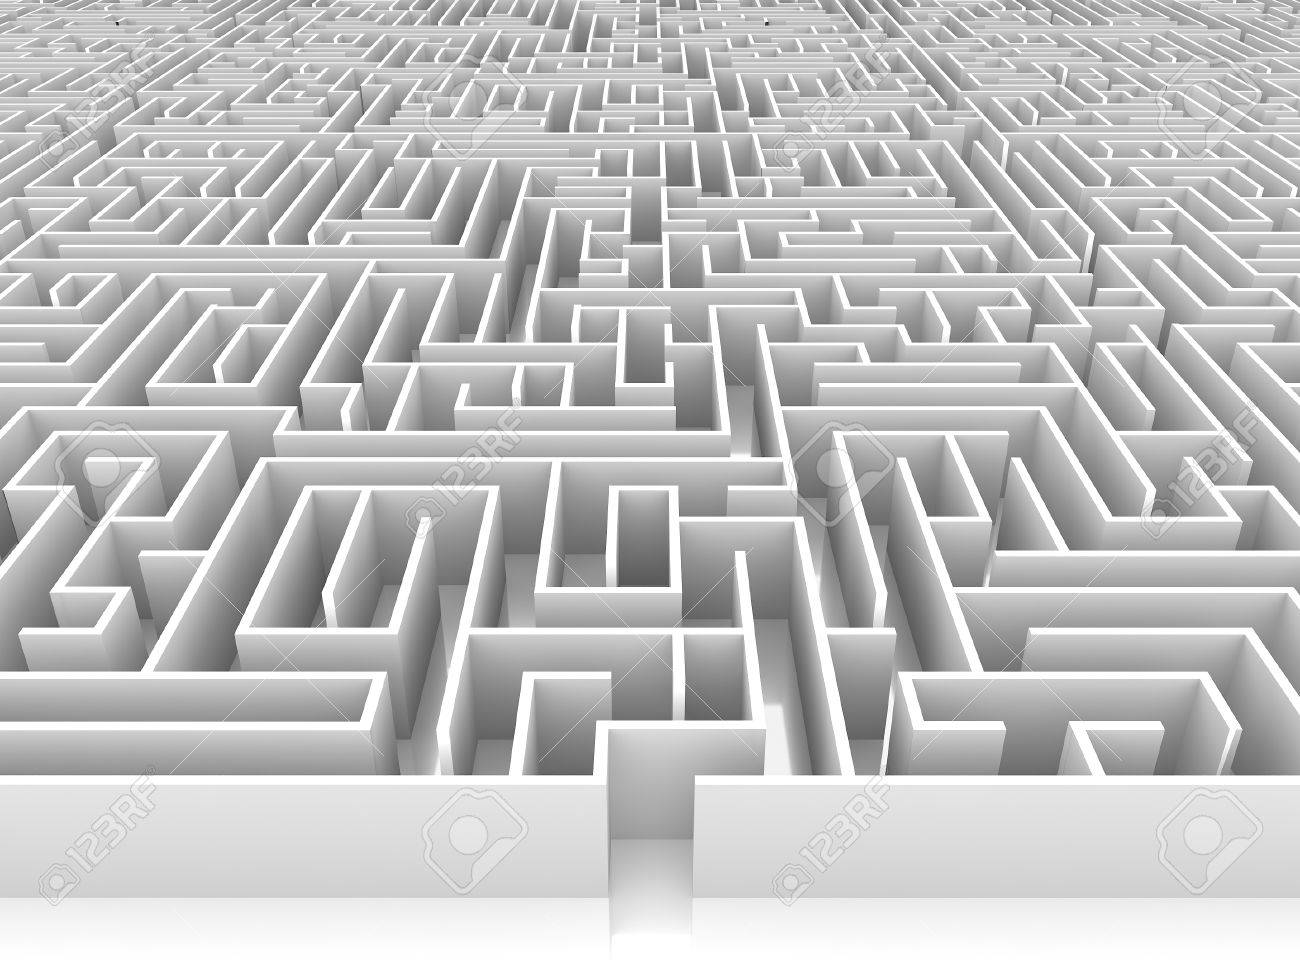 endless maze 3d illustration - 43119112